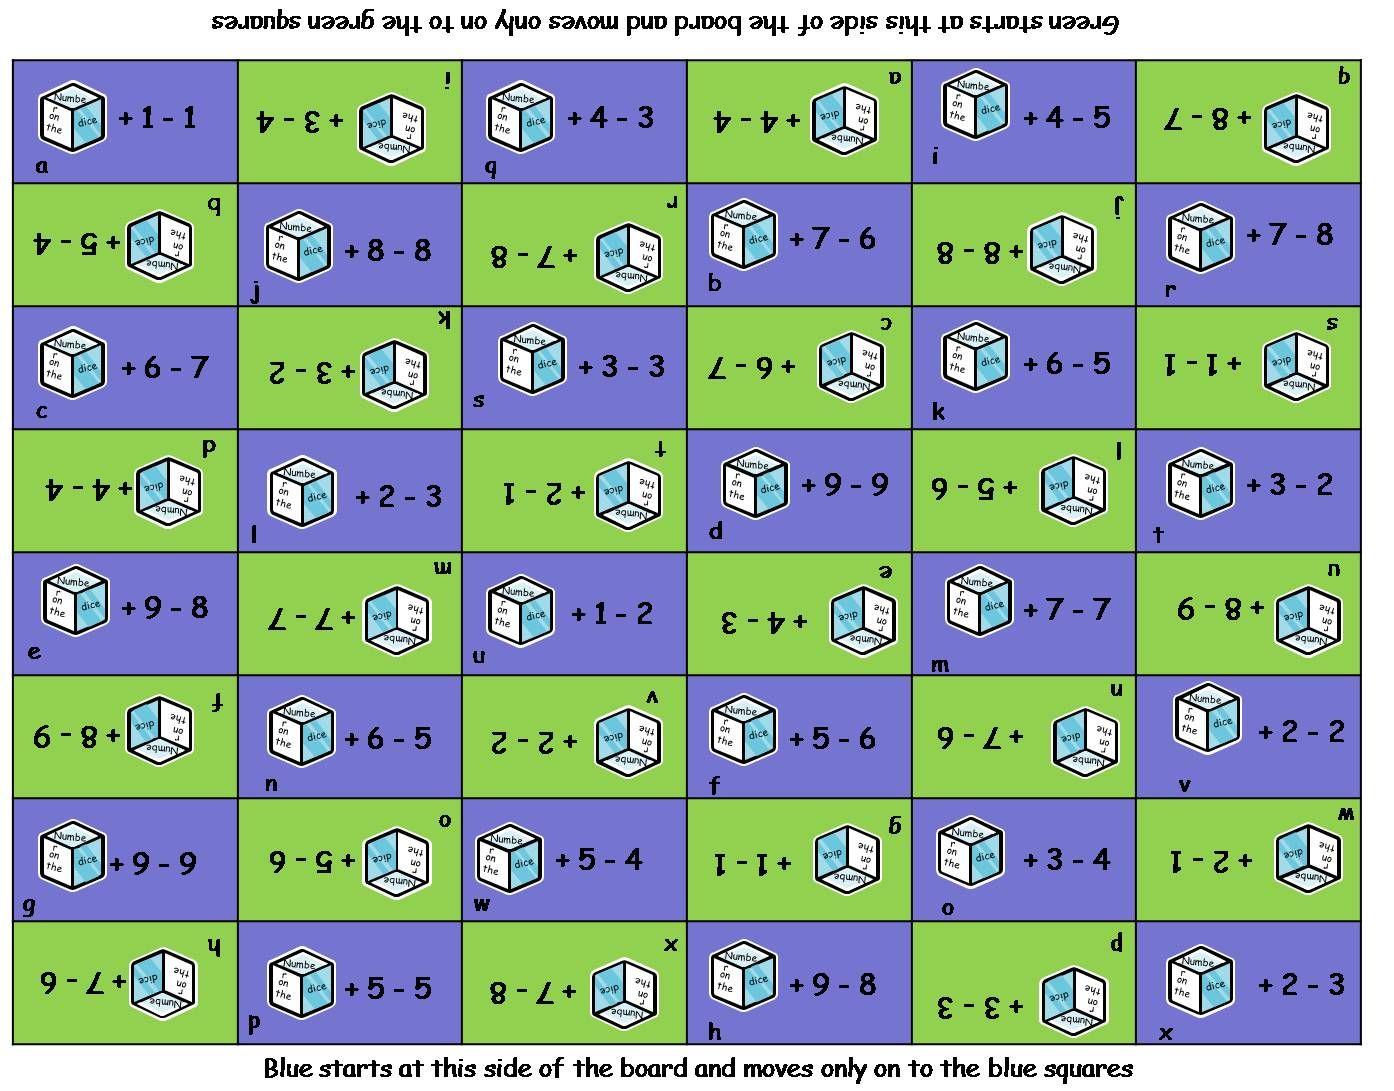 alien board game printable - Google Search | Math | Pinterest | Math